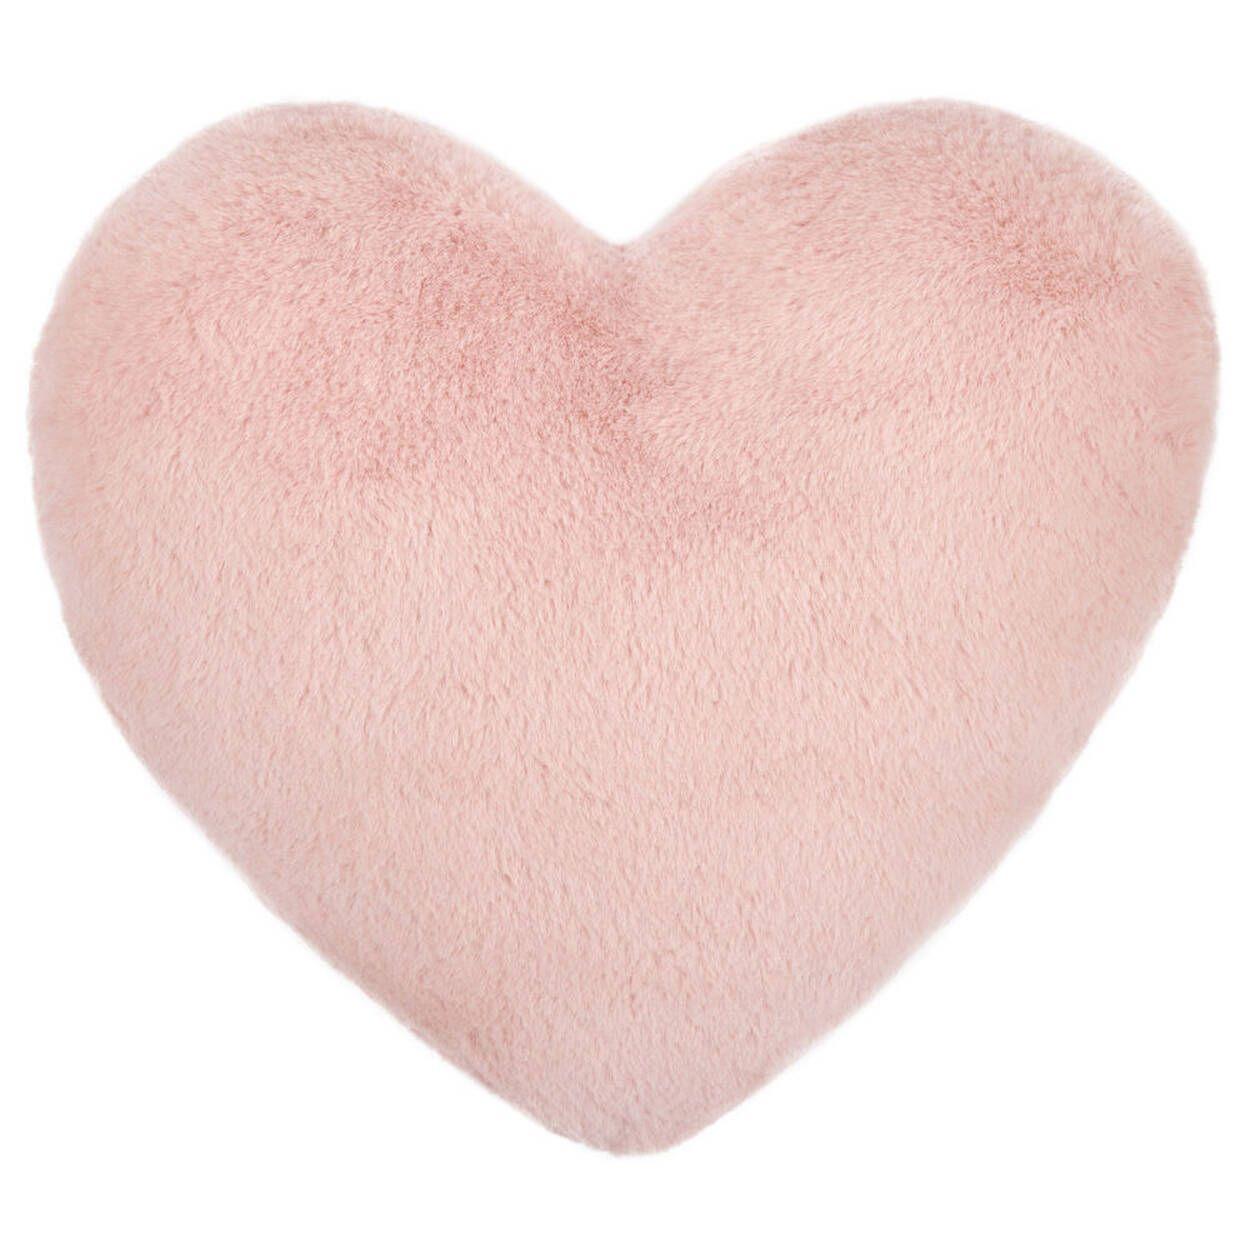 Wila Heart Shaped Decorative Pillow 14